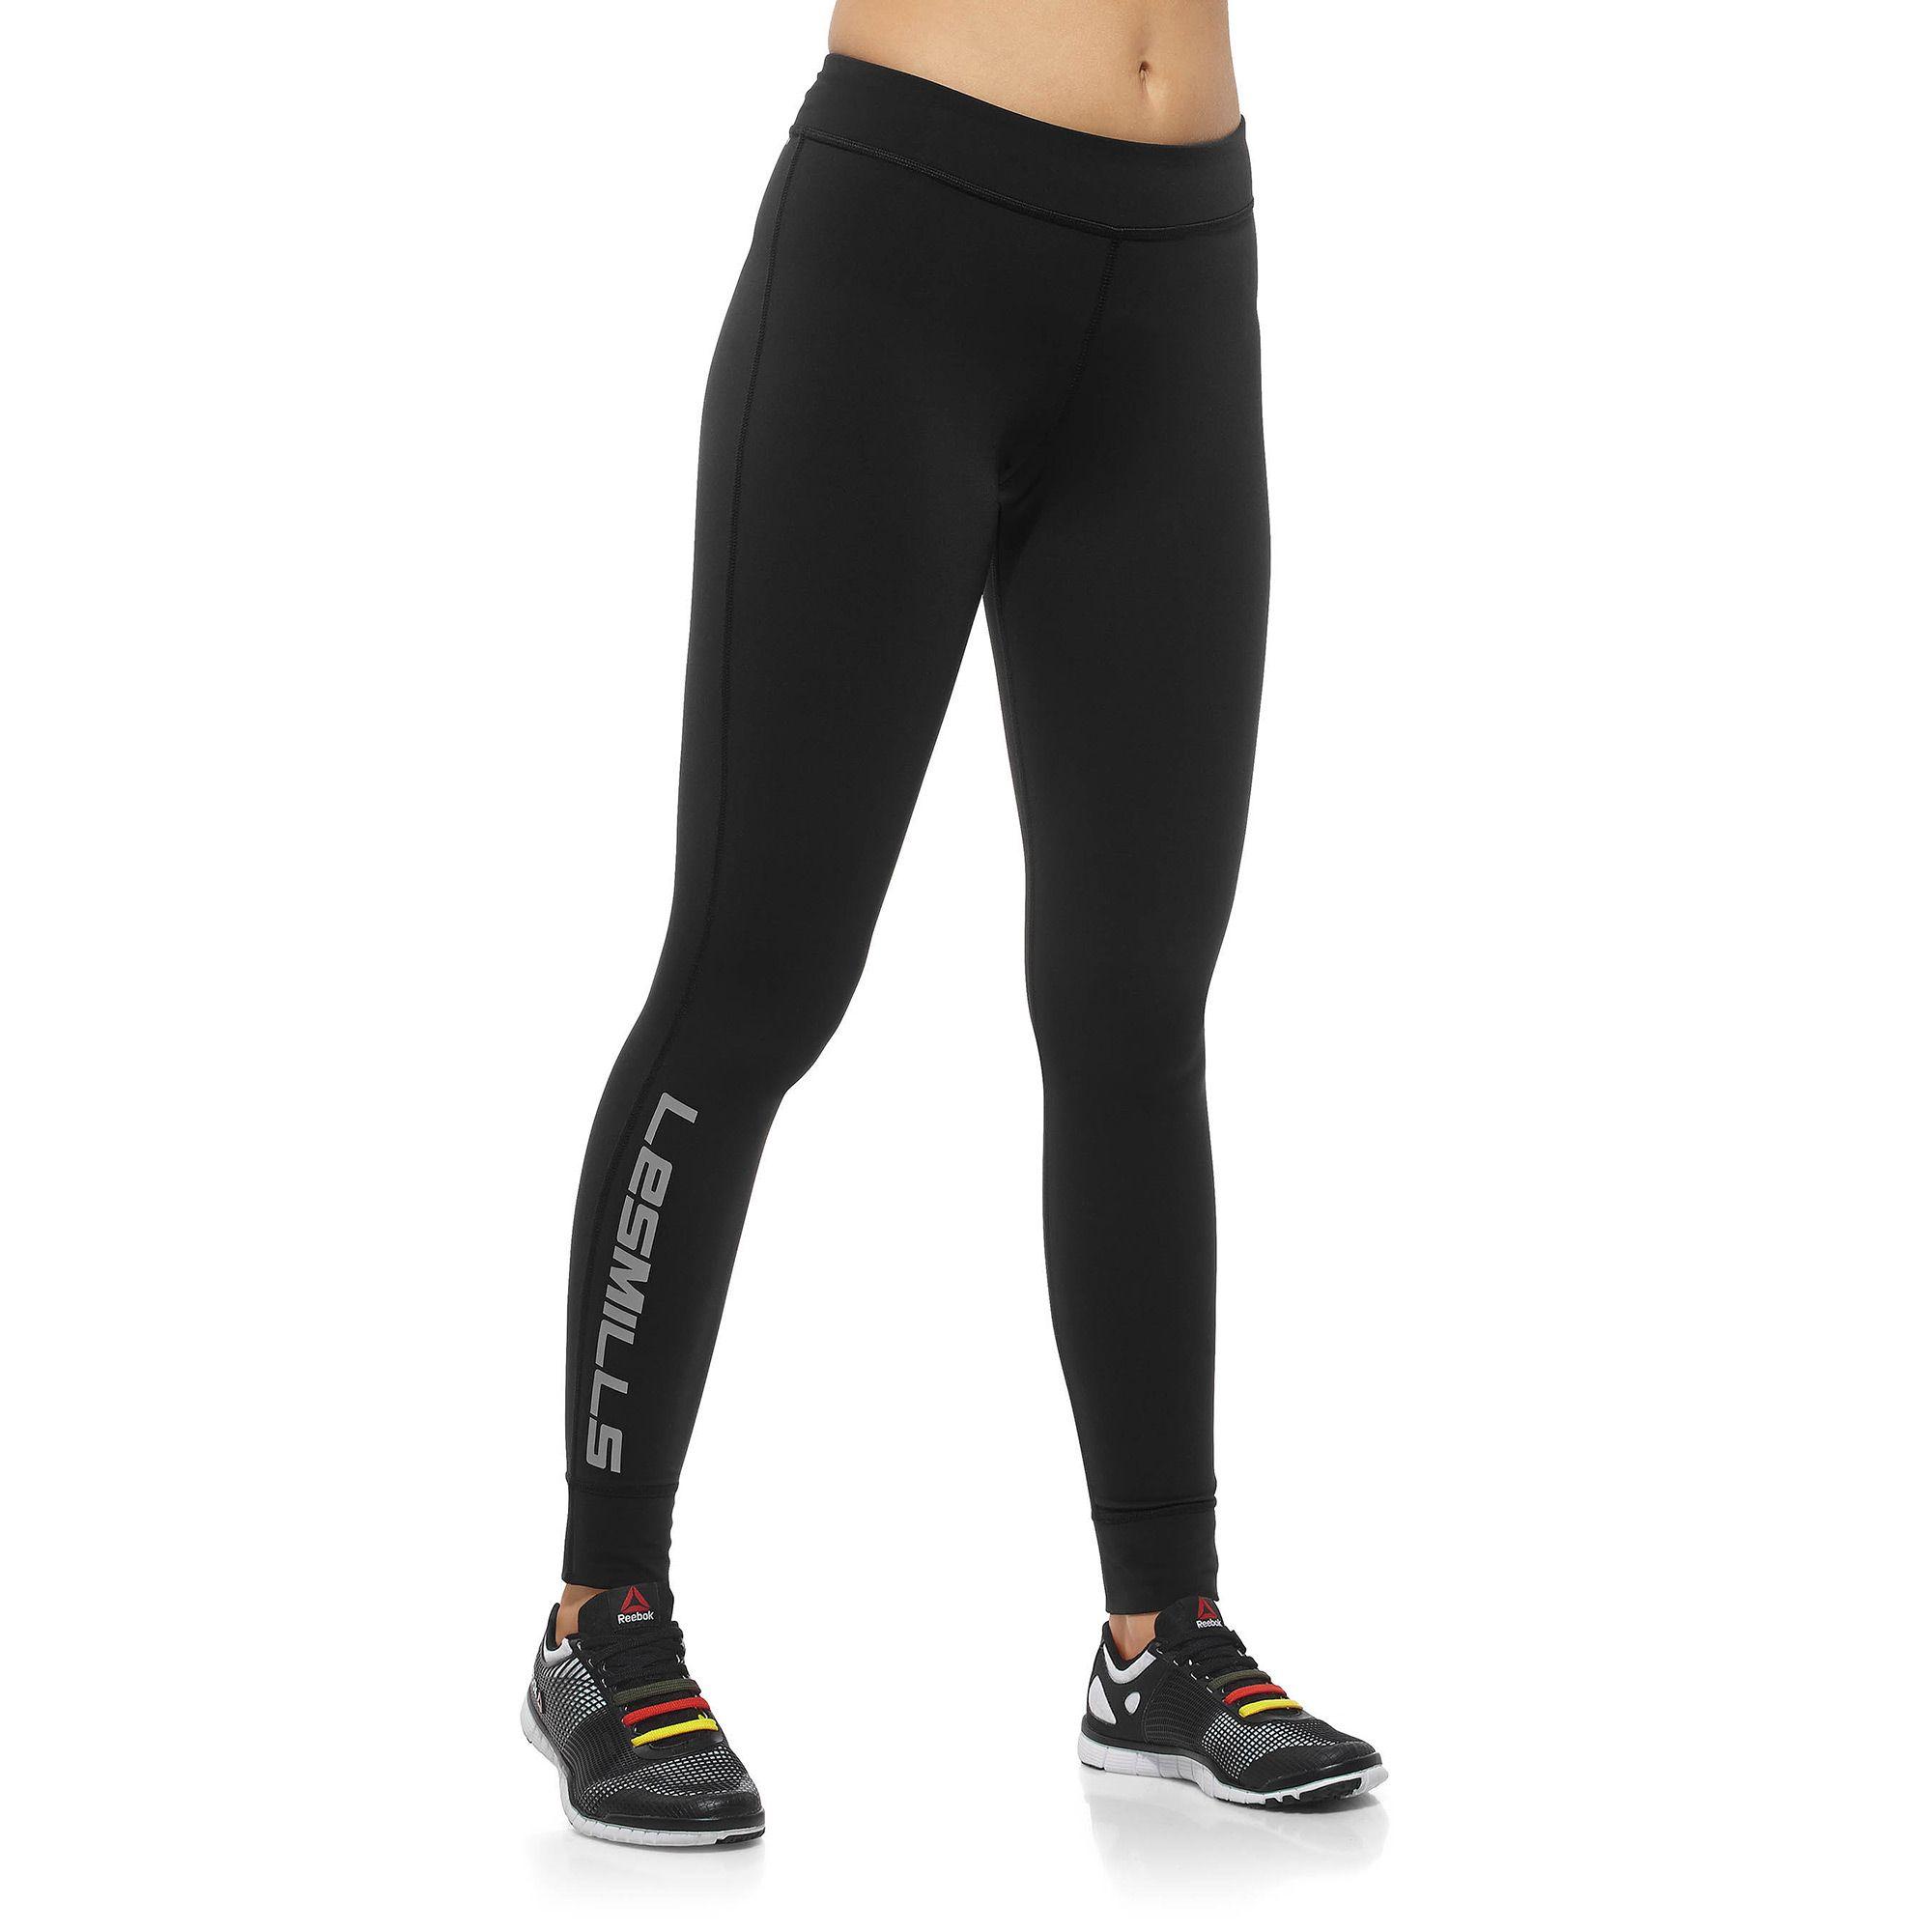 Womens REEBOK Training Leggings High Rise Pants Yoga Excercise Running Gym USA